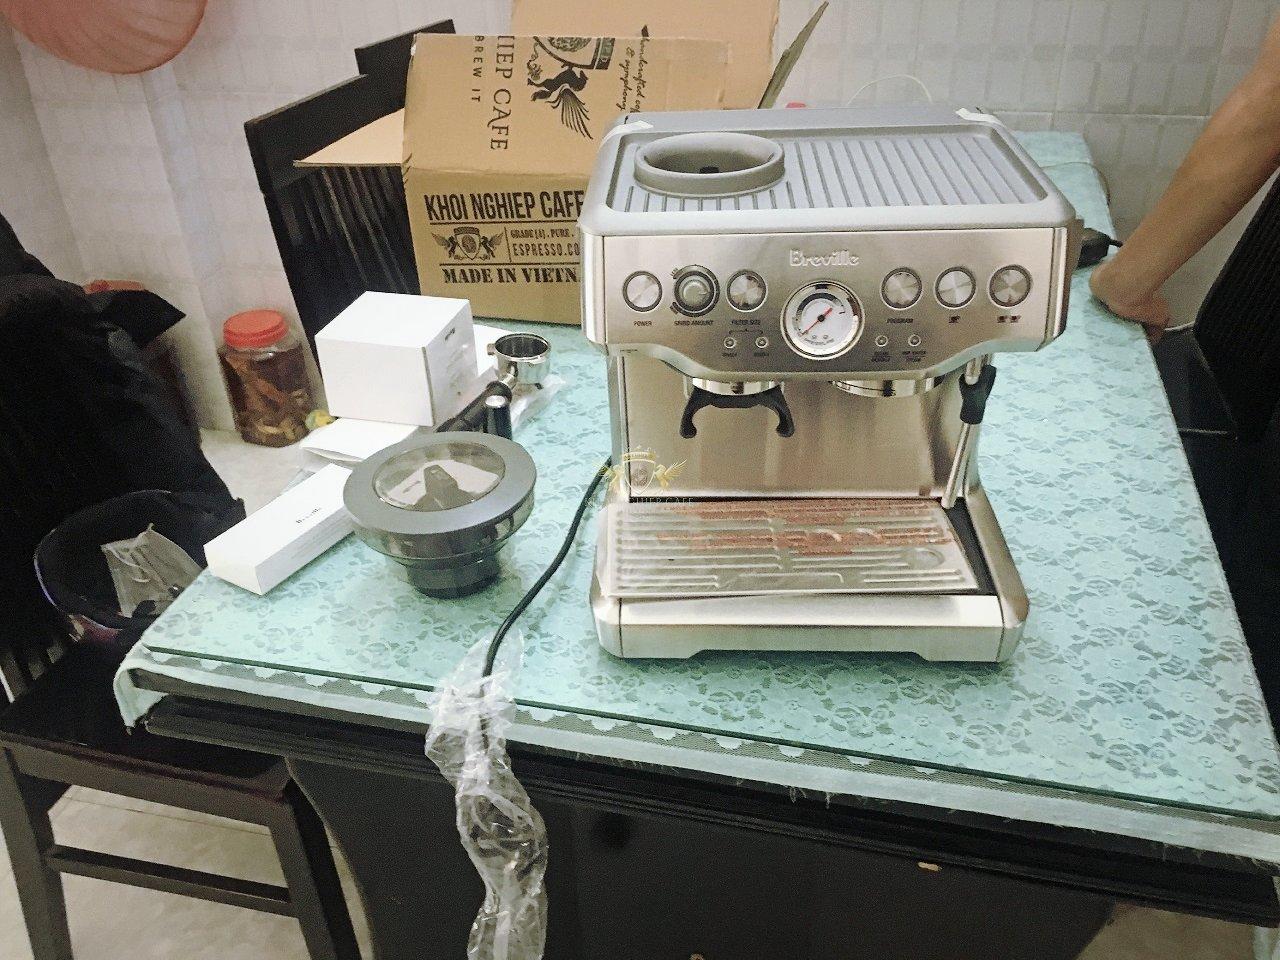 Mua ban may pha cafe nho breville viet nam khoi nghiep cafe quan 5 ho chi minh 2